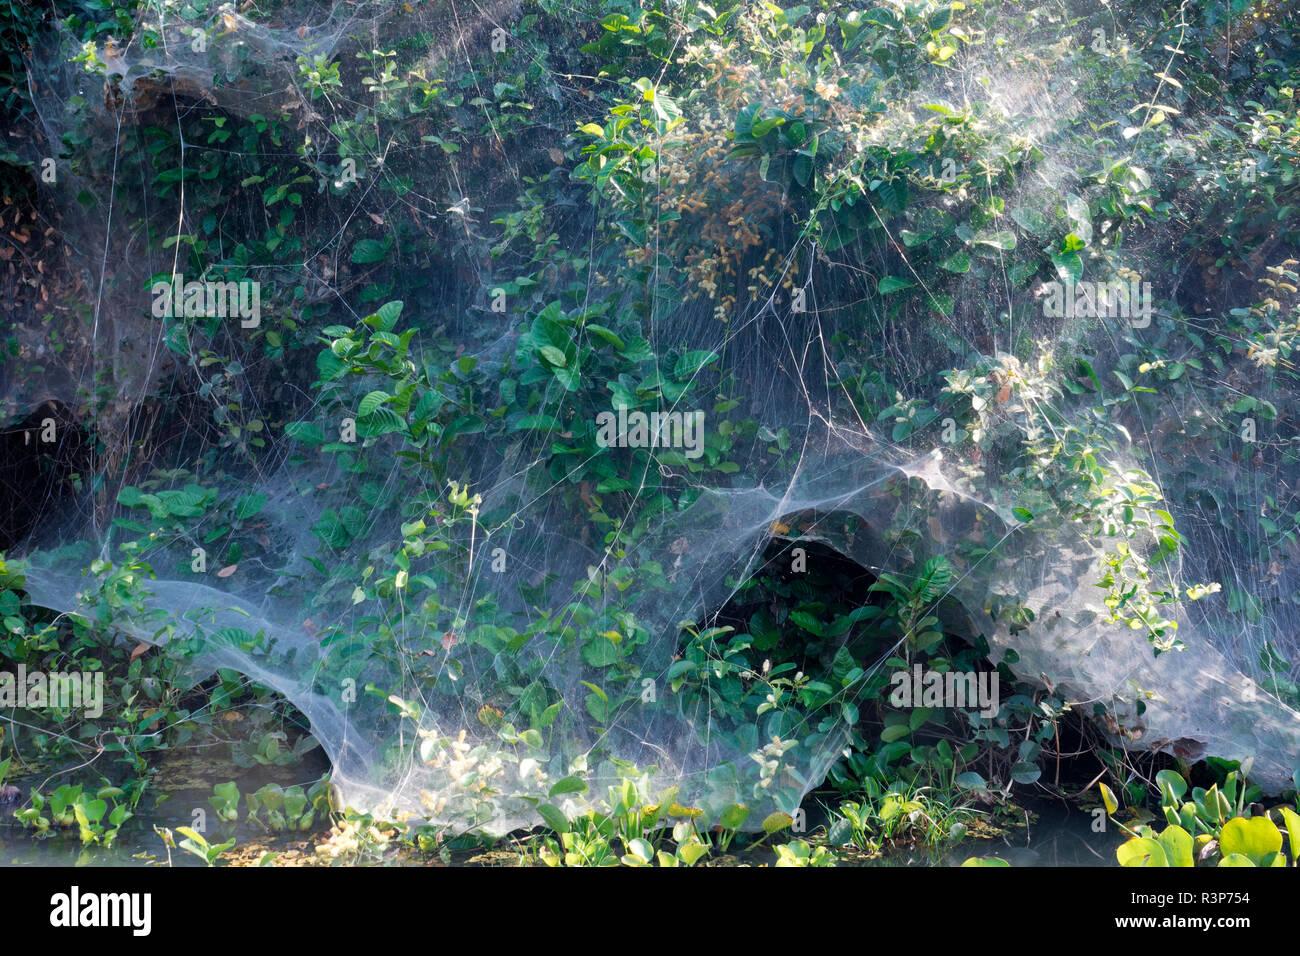 Social Spider (Anelosimus eximius) net, Pantanal, Brazil - Stock Image